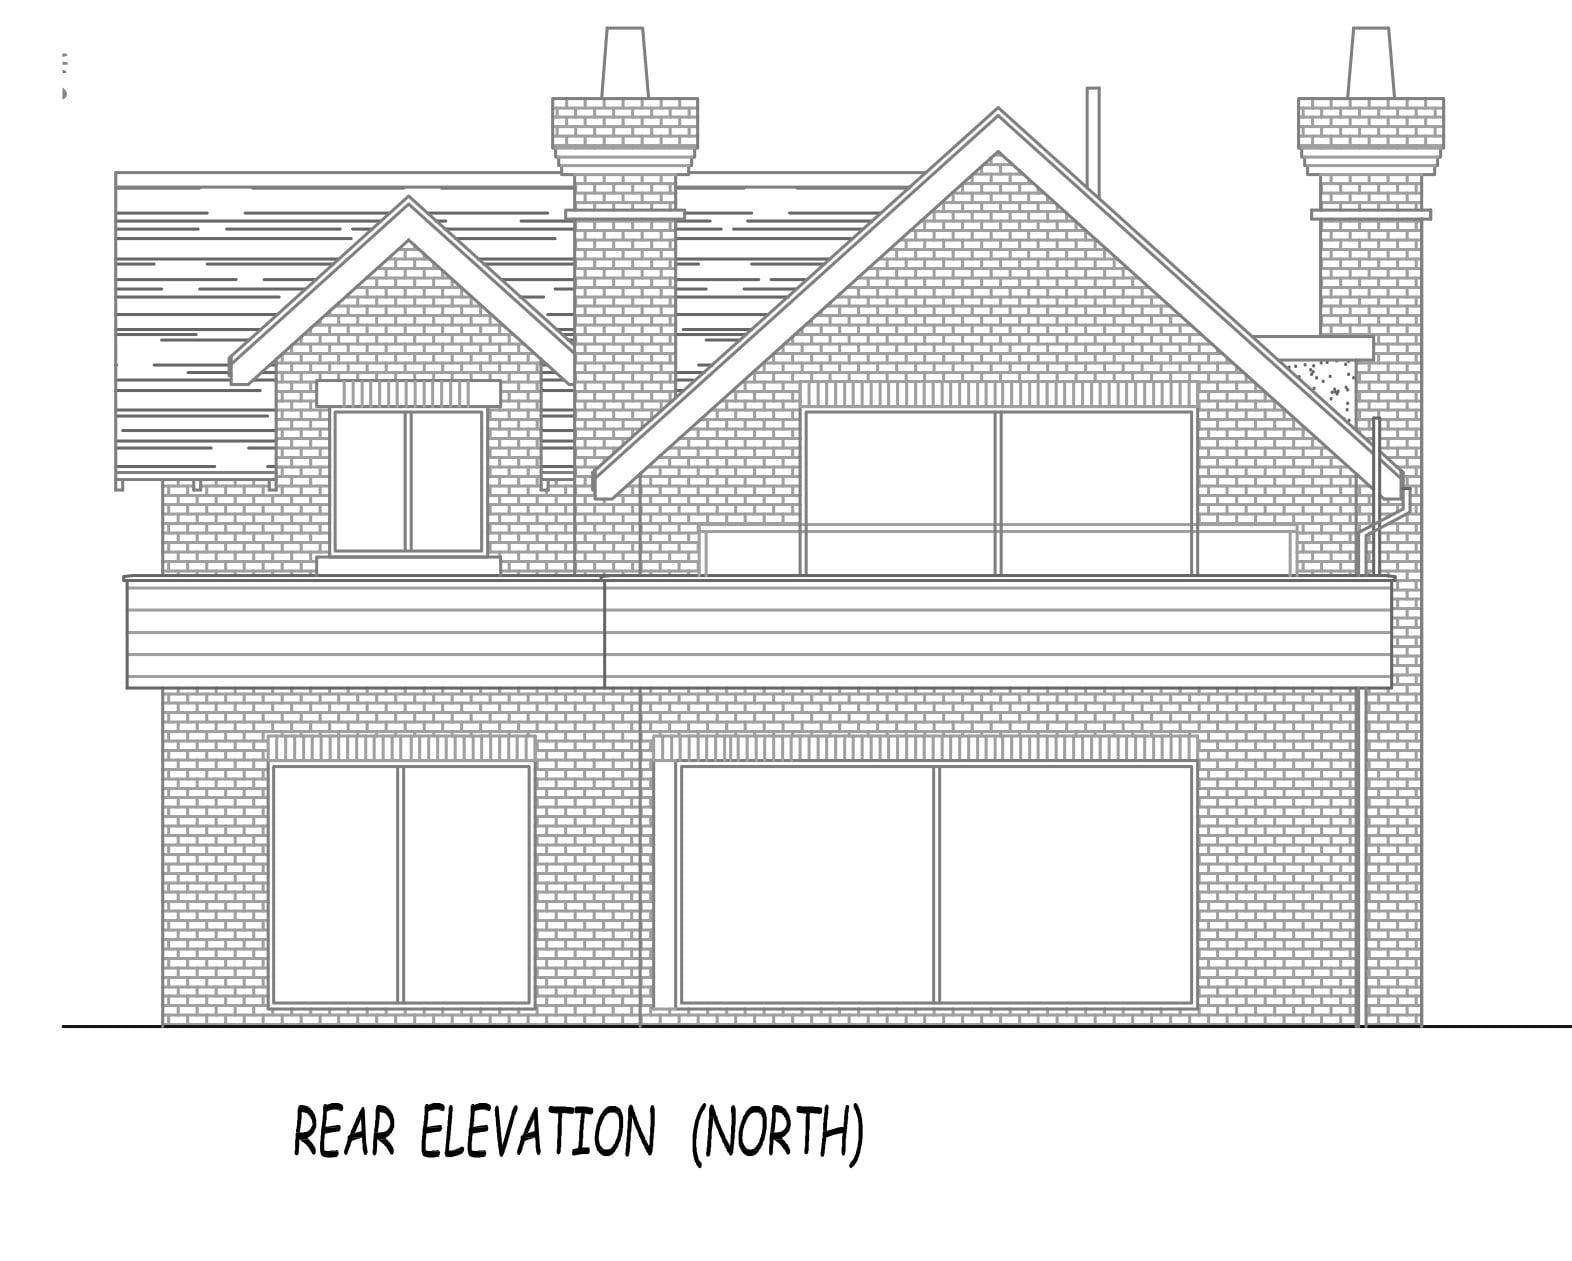 Wild Goose architect plan rear view